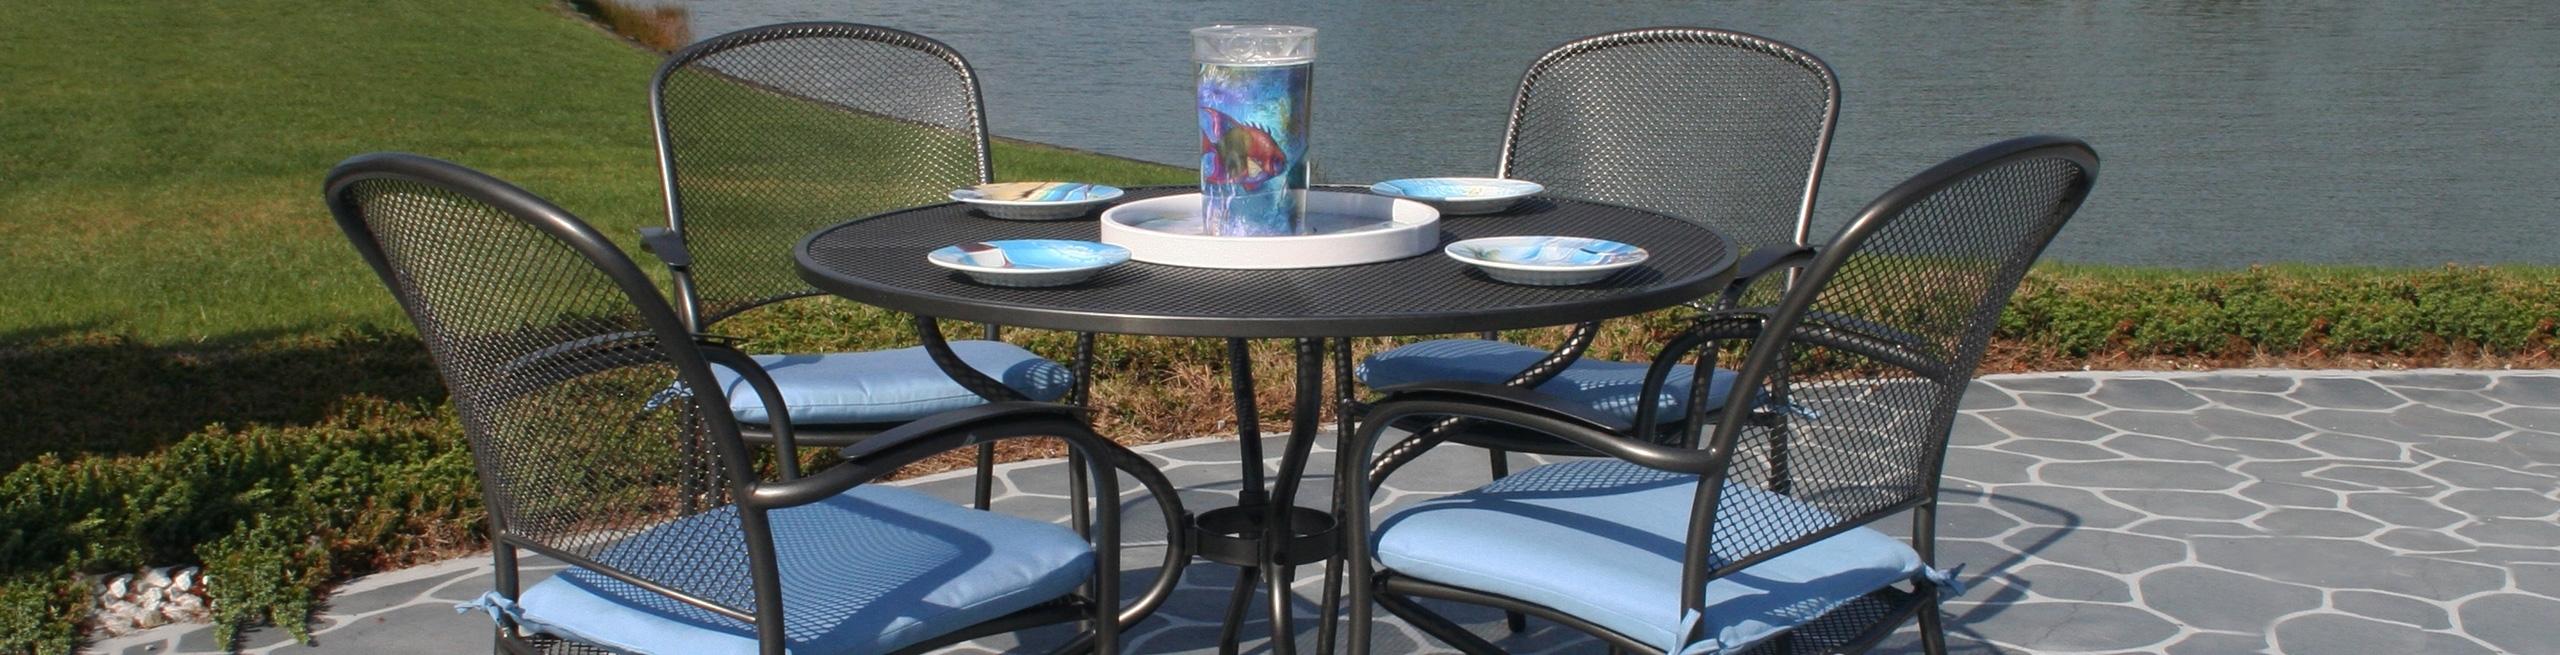 Kettler Patio Umbrellas With Famous Outdoor Patio Furniture: Kettler Patio Furniture (View 3 of 20)